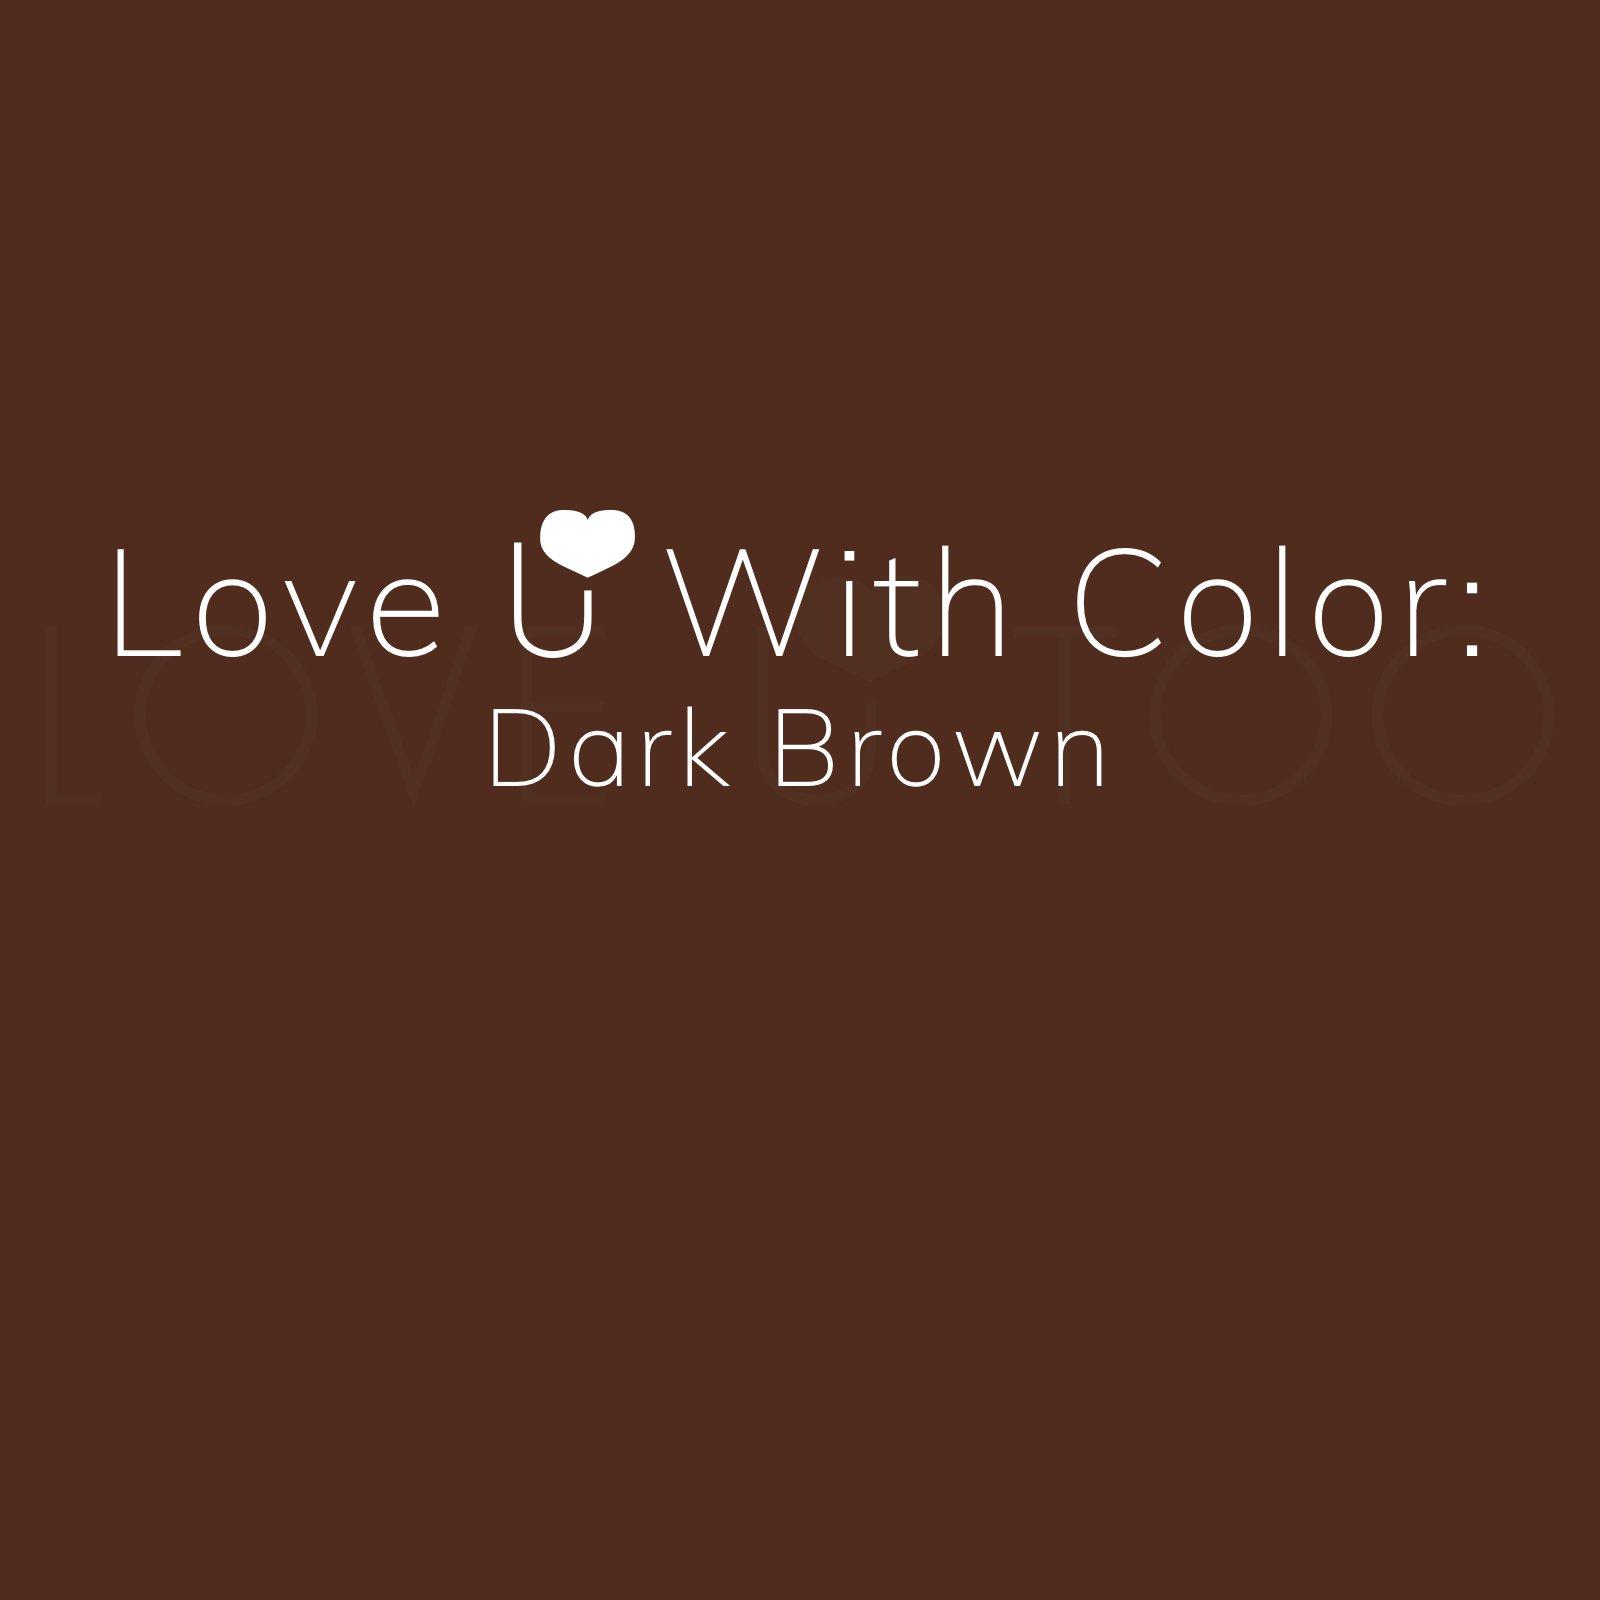 Love U With Color: Dark Brown